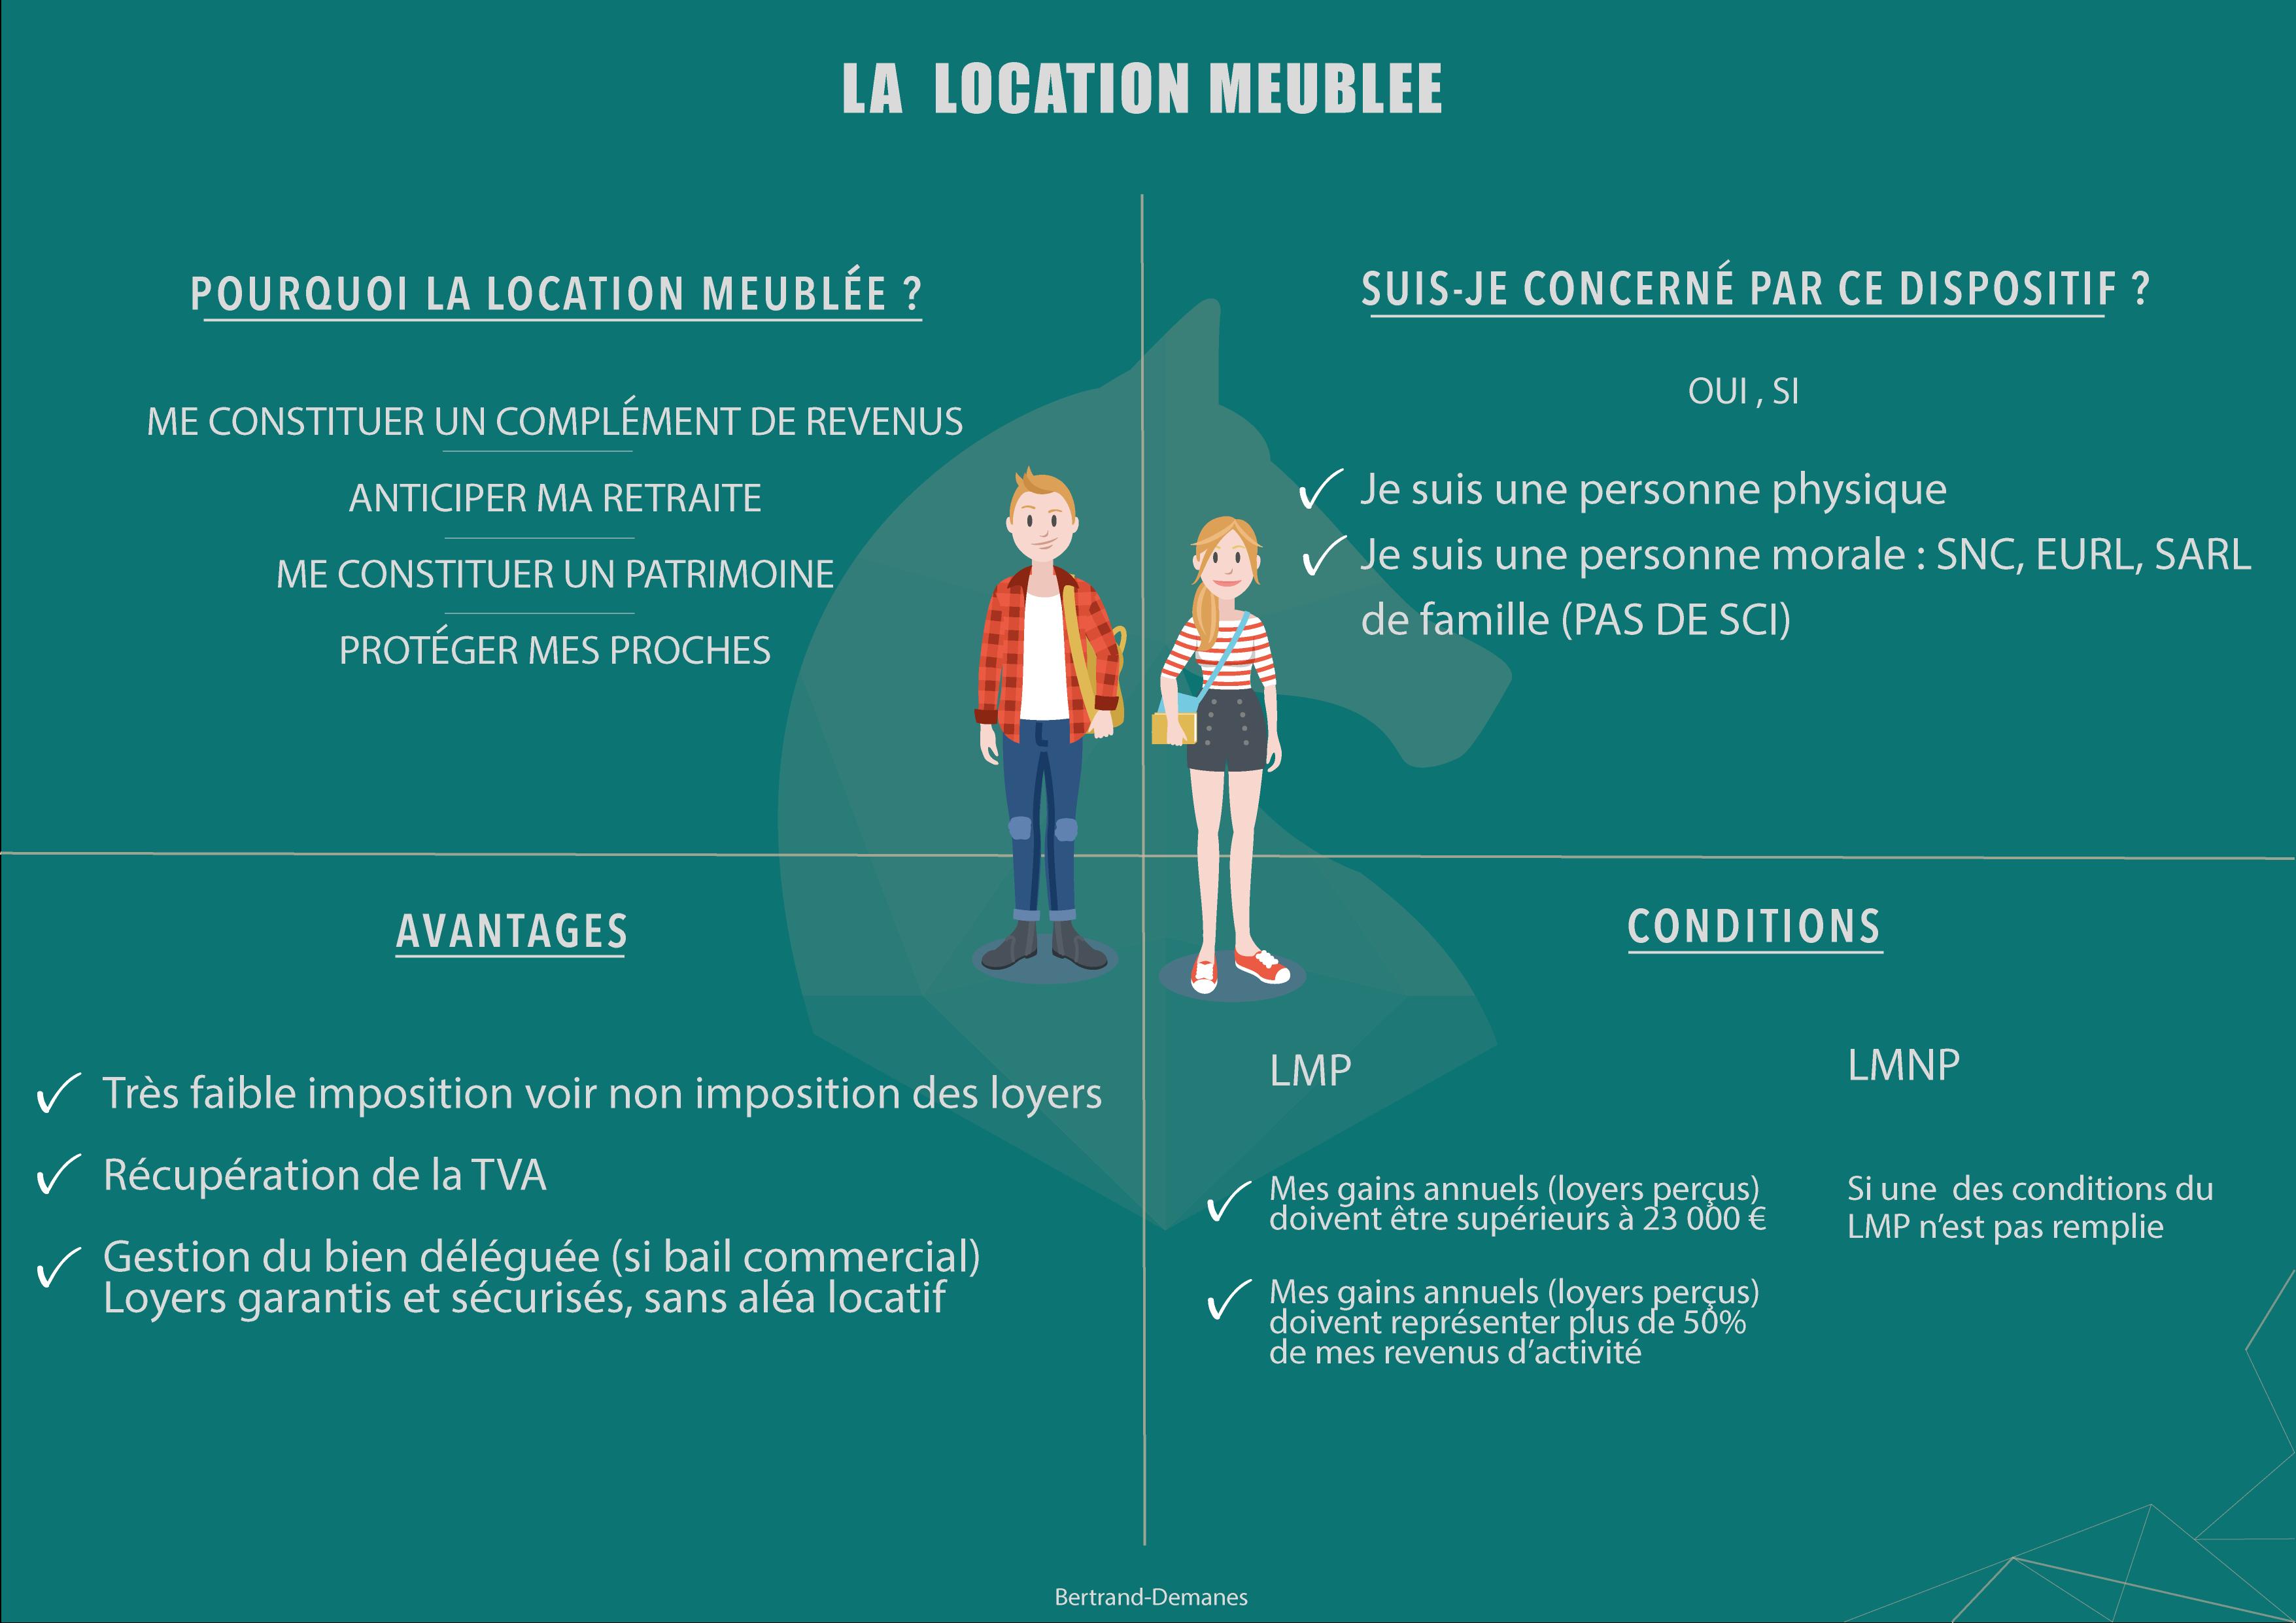 infographie-location-meublee-nice-bertrand-demanes